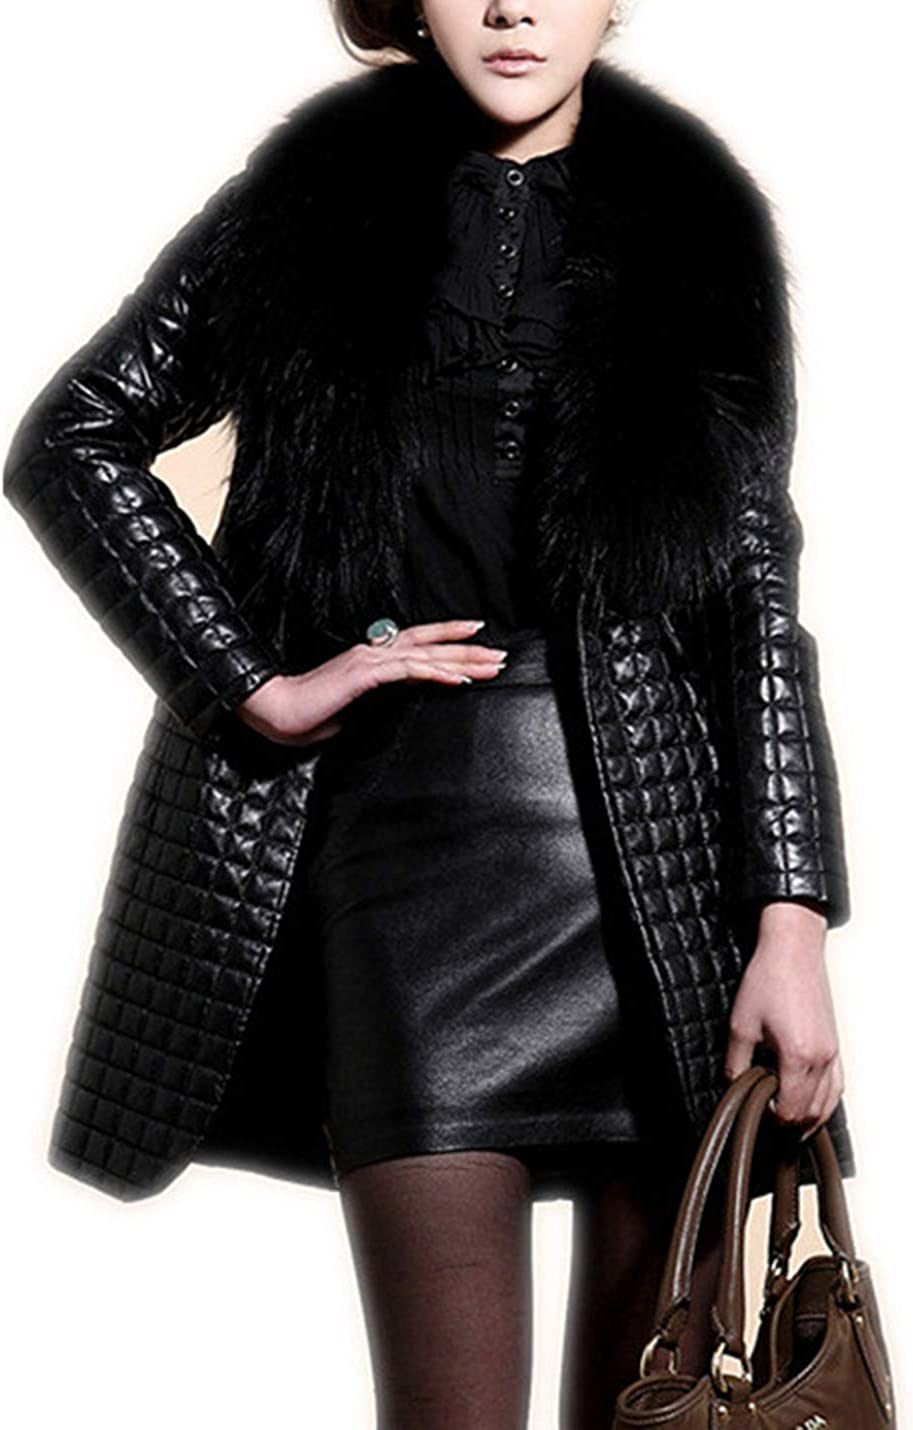 PAODIKUAI Women's Fox Fur Faux Leather Jackets Diamond Quilted Lightweight Jacket